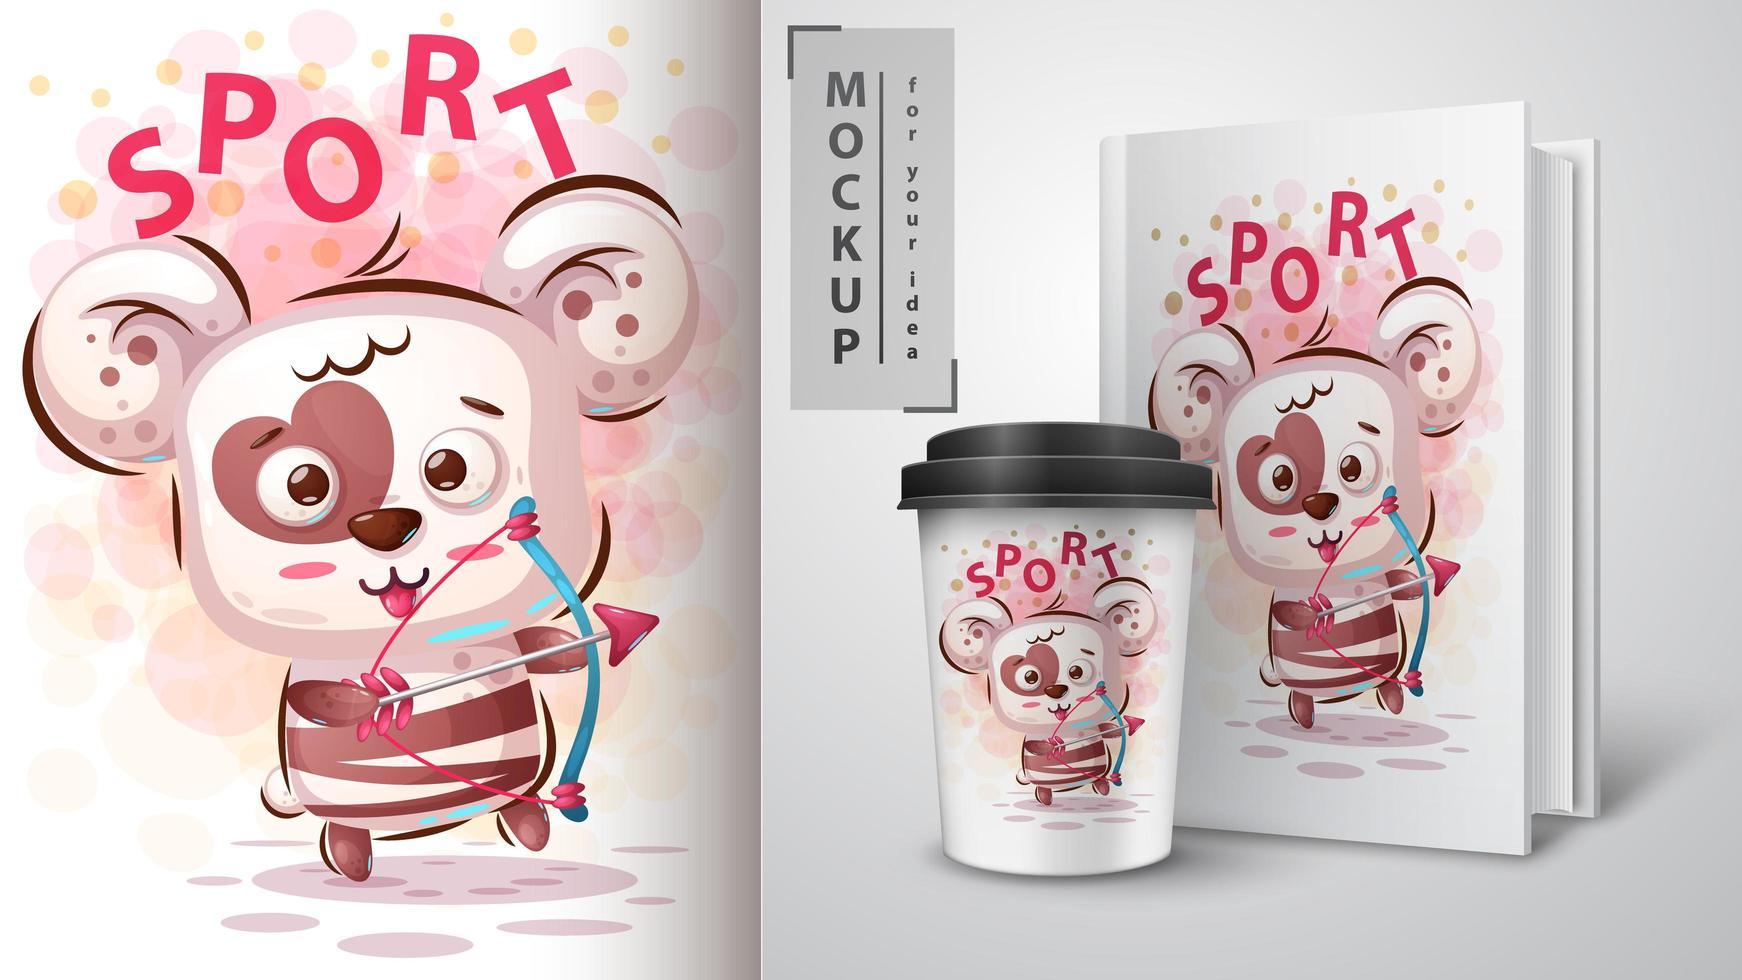 panda björn sport affisch design vektor